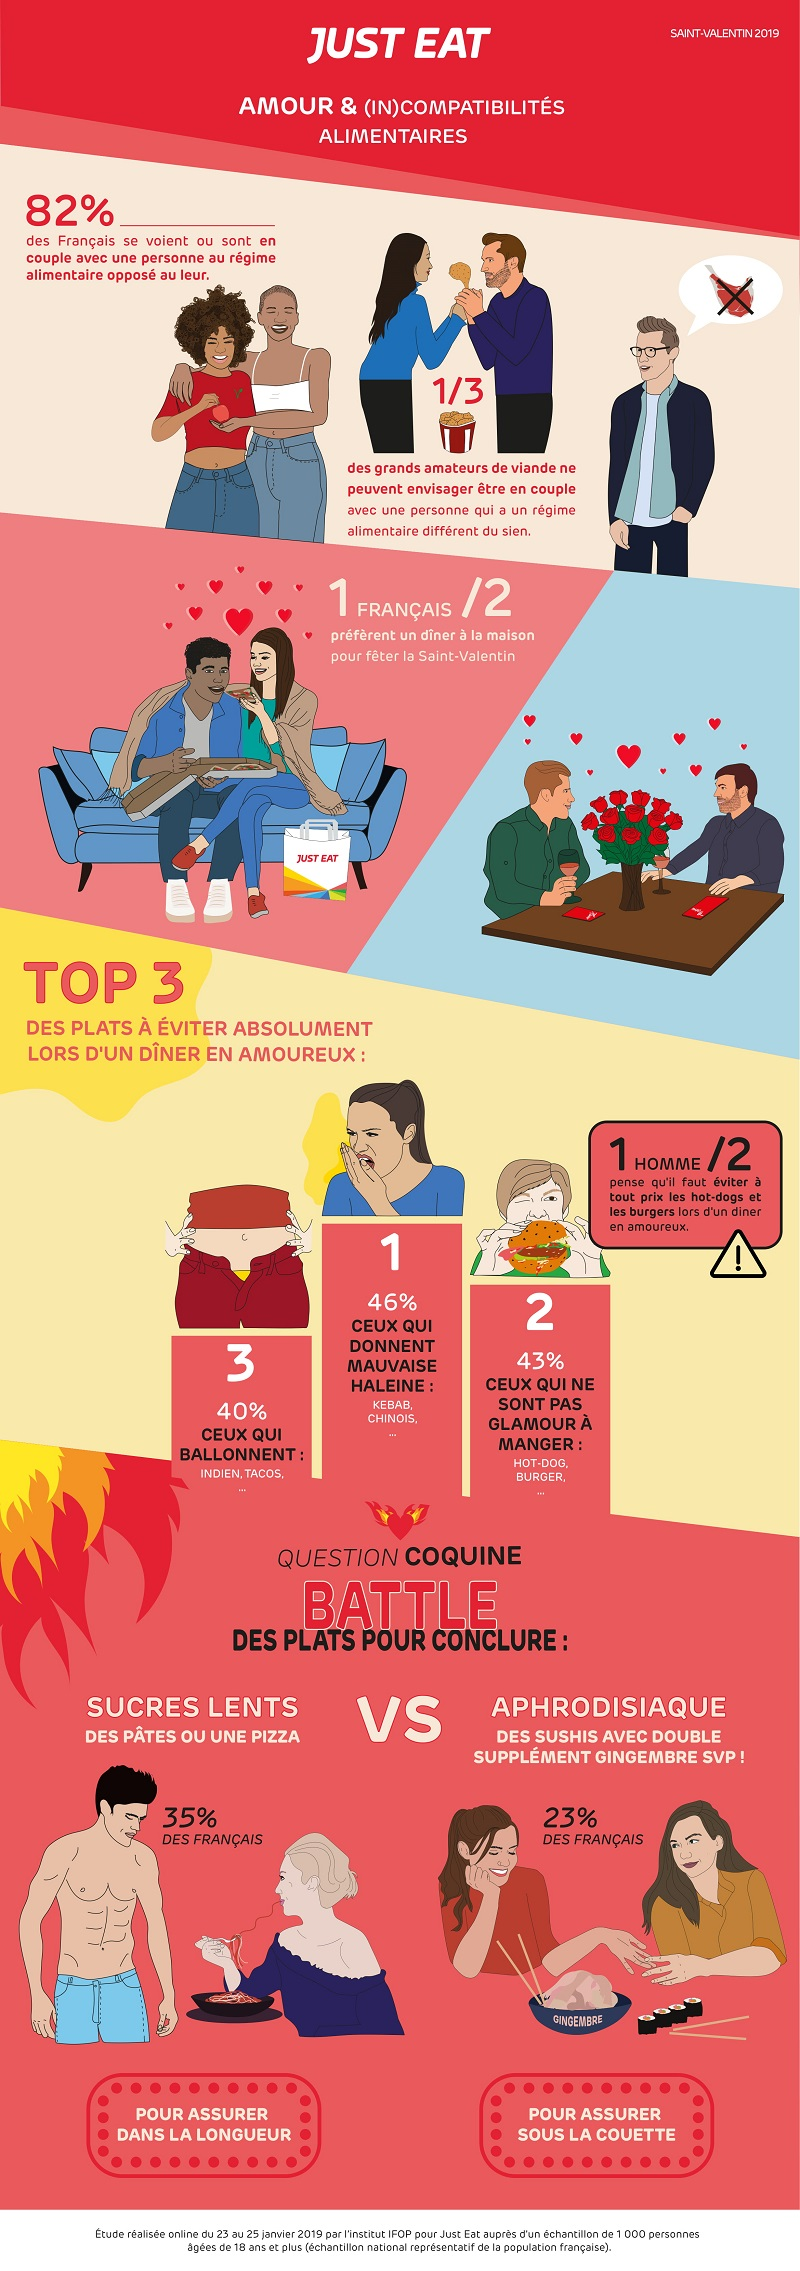 infographie-saint-valentin-just-eat